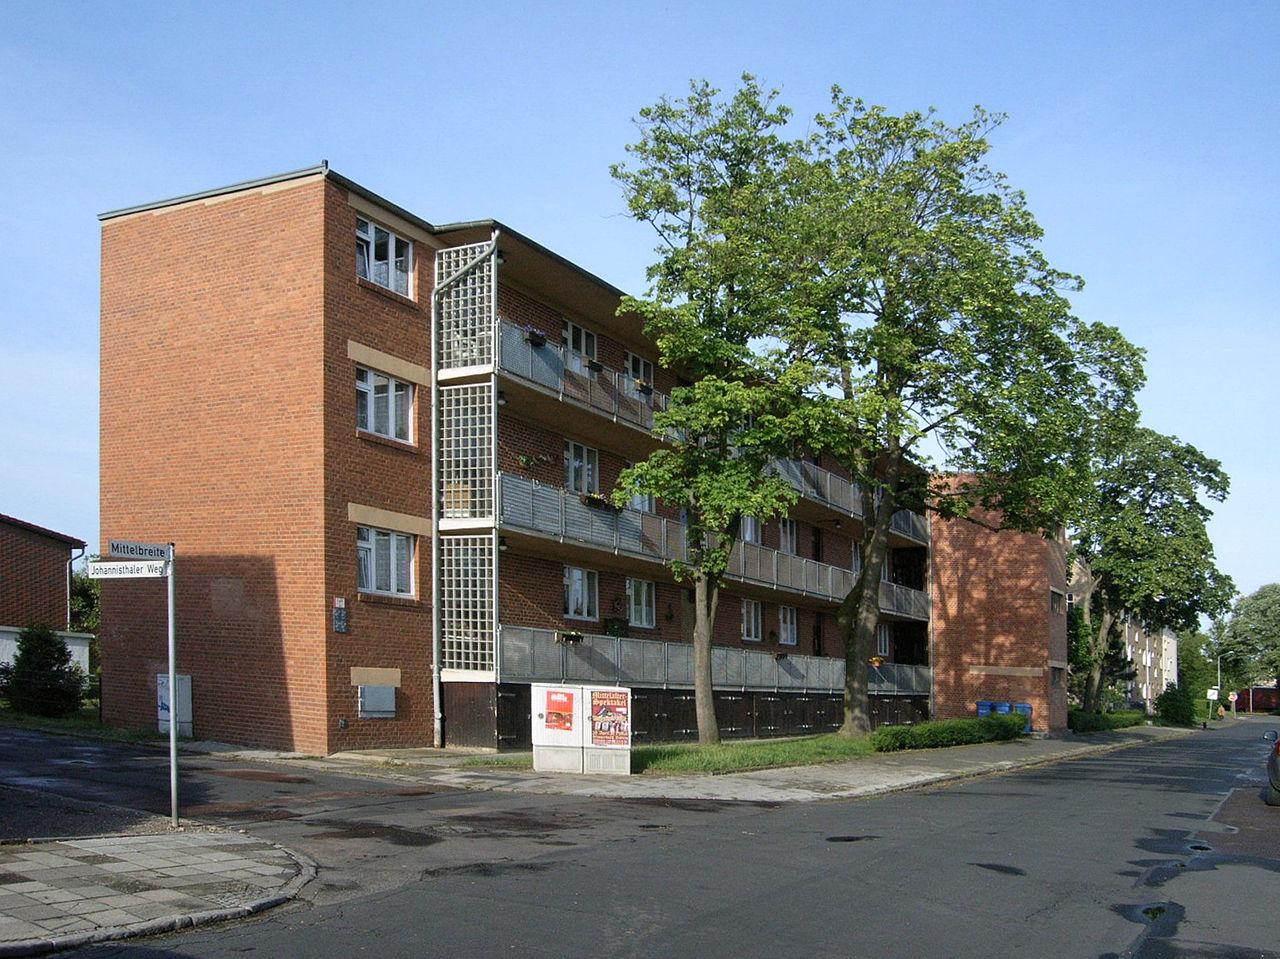 Bild Laubenganghäuser Dessau